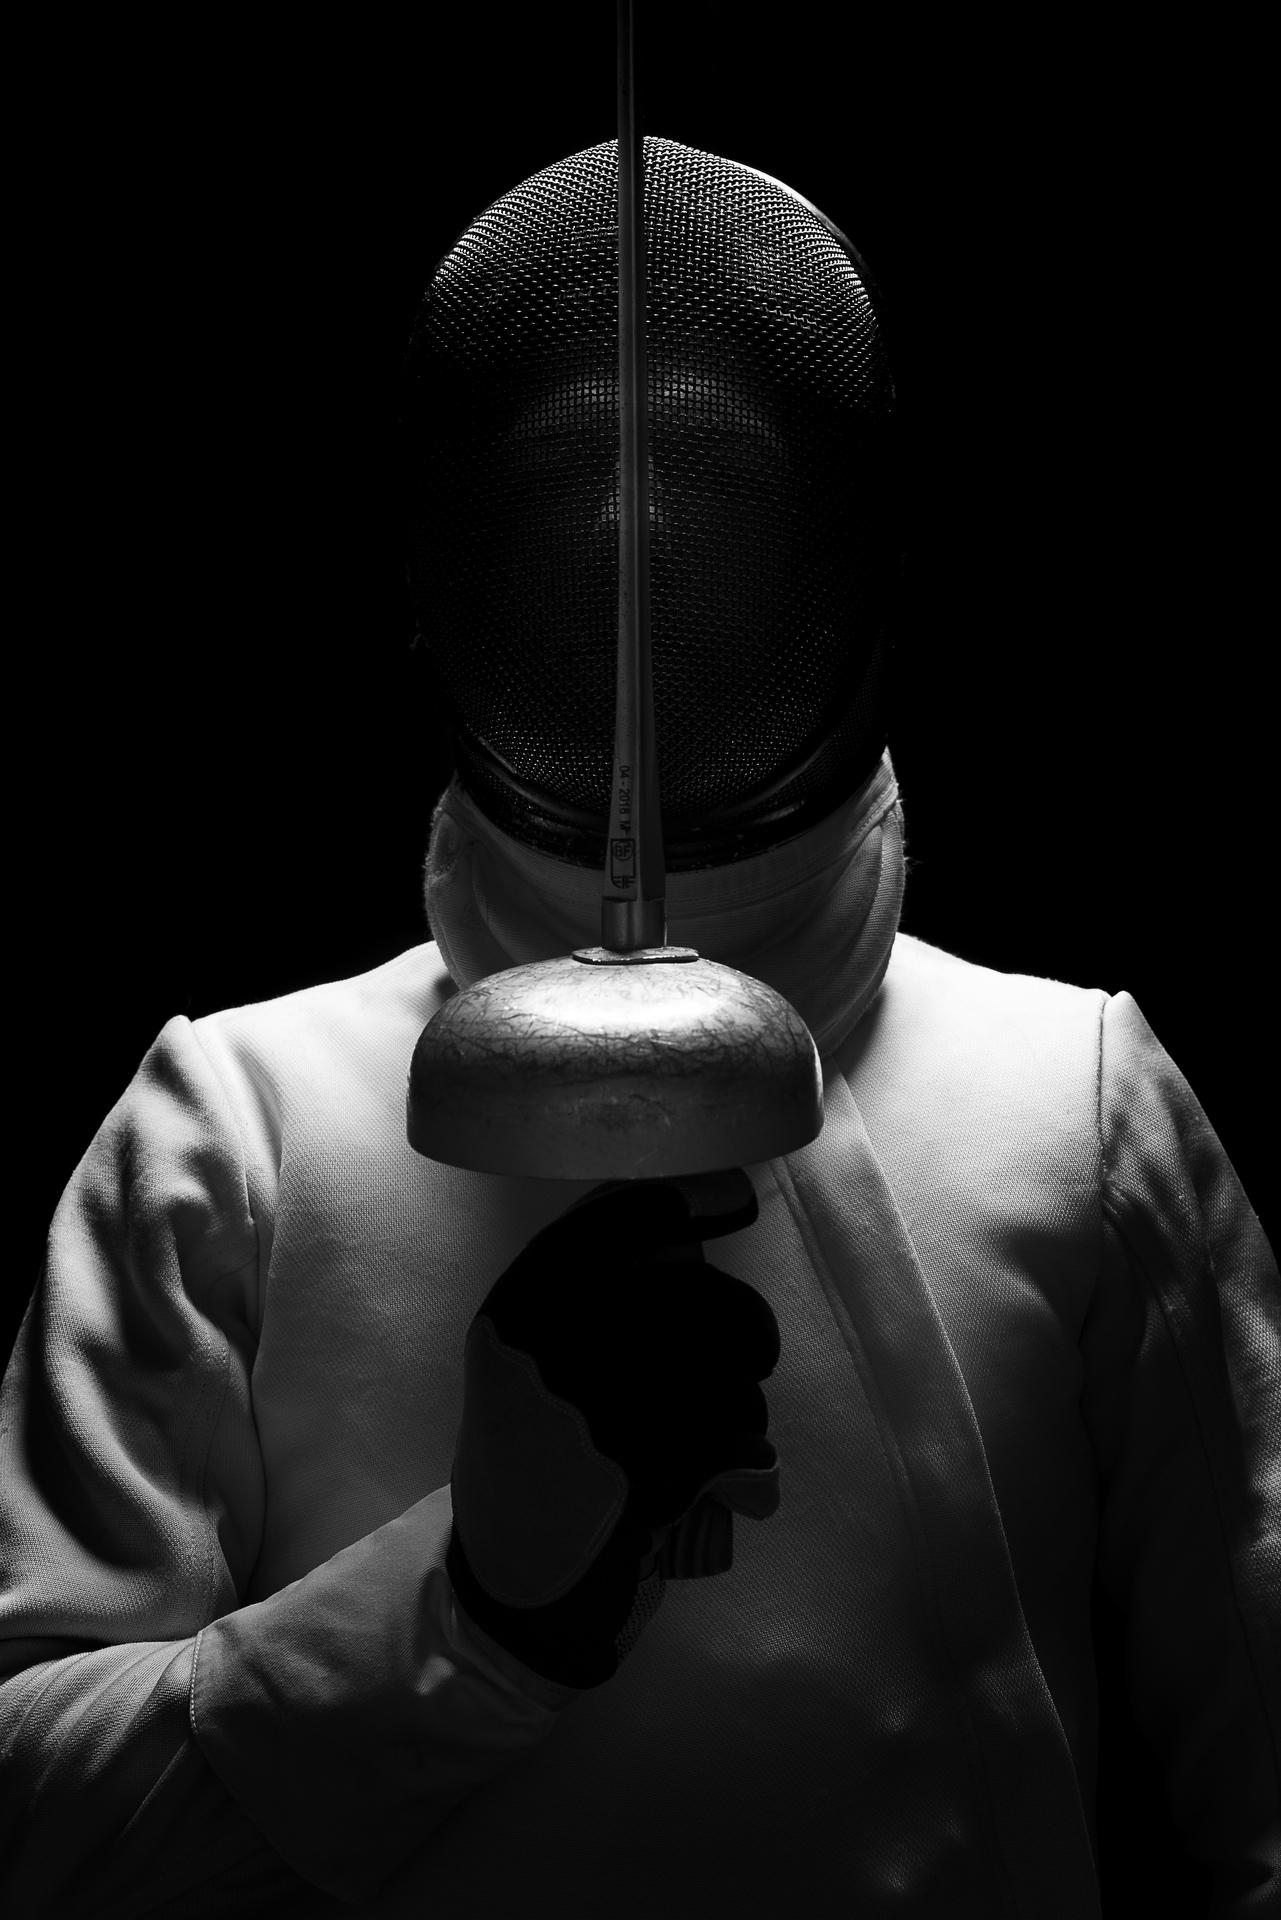 Sydney portrait photographer, personal branding, head shots, corporate photography, sport photography, fencing, Olympics